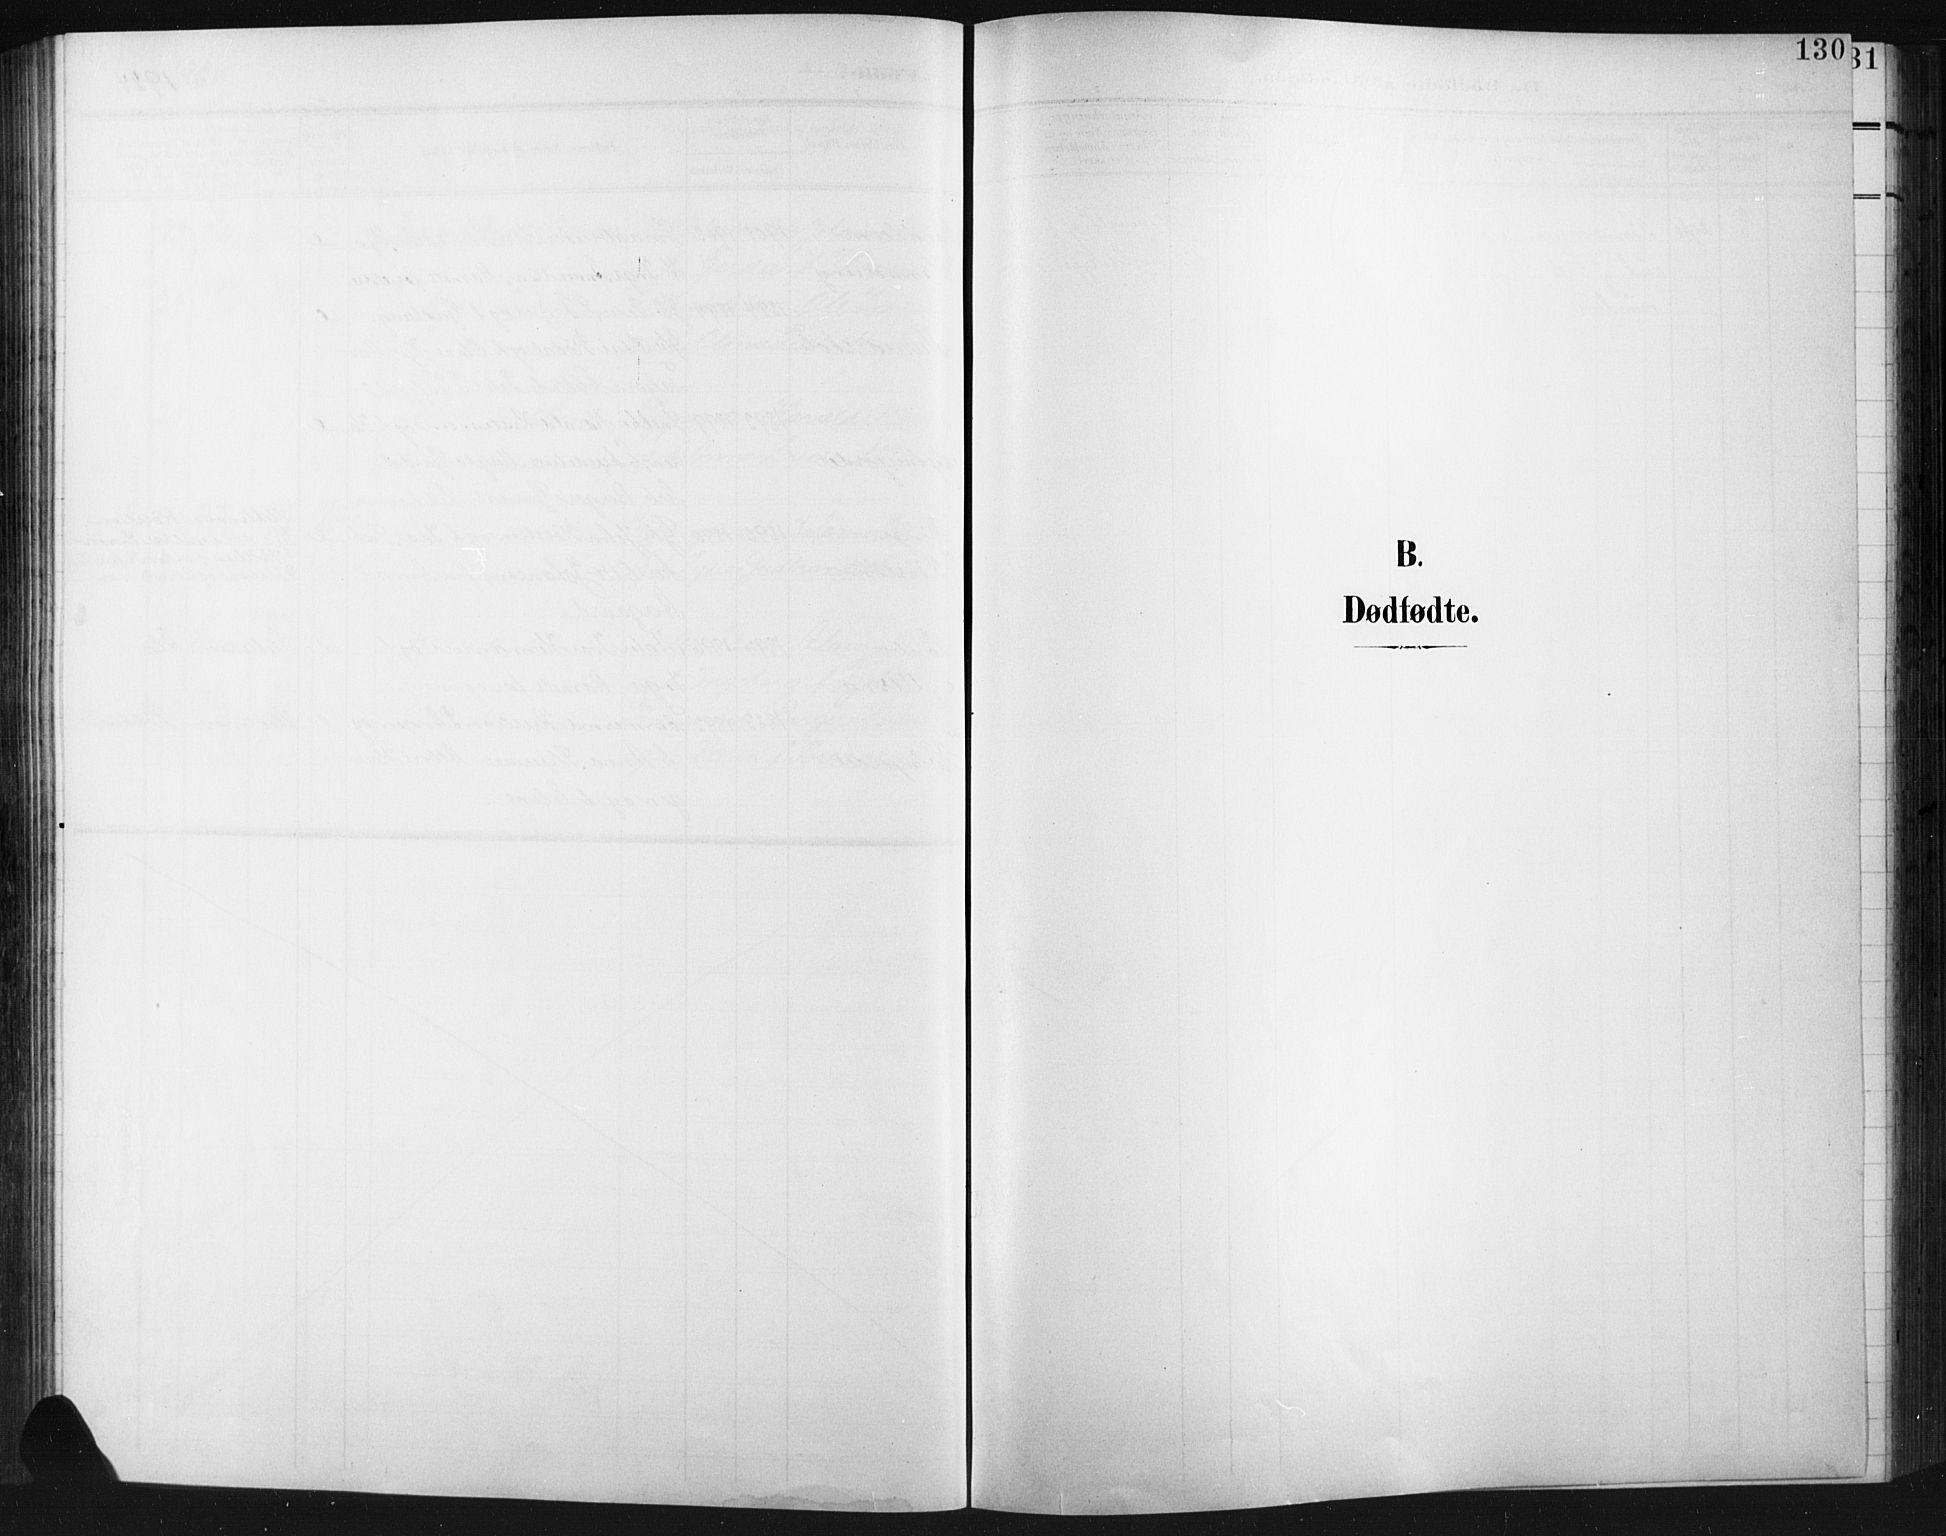 SAH, Fåberg prestekontor, H/Ha/Hab/L0012: Parish register (copy) no. 12, 1903-1924, p. 130